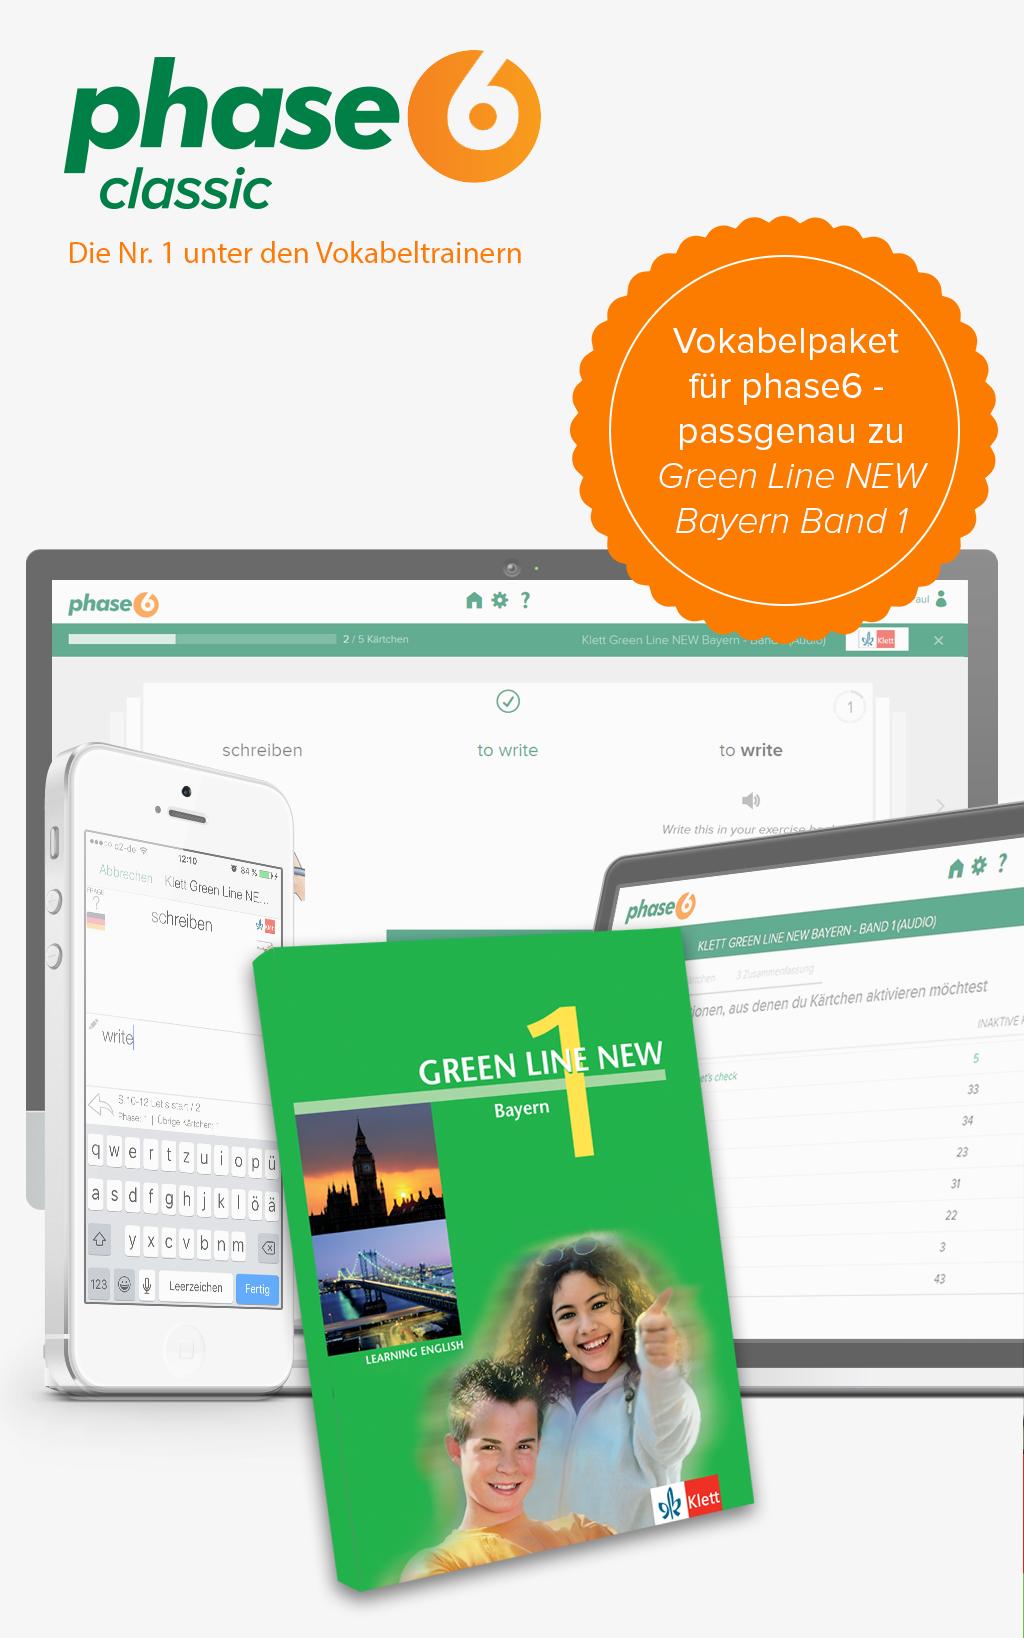 phase-6 Vokabelpaket zu Green Line NEW Bayern - Band 1 [Online Code]